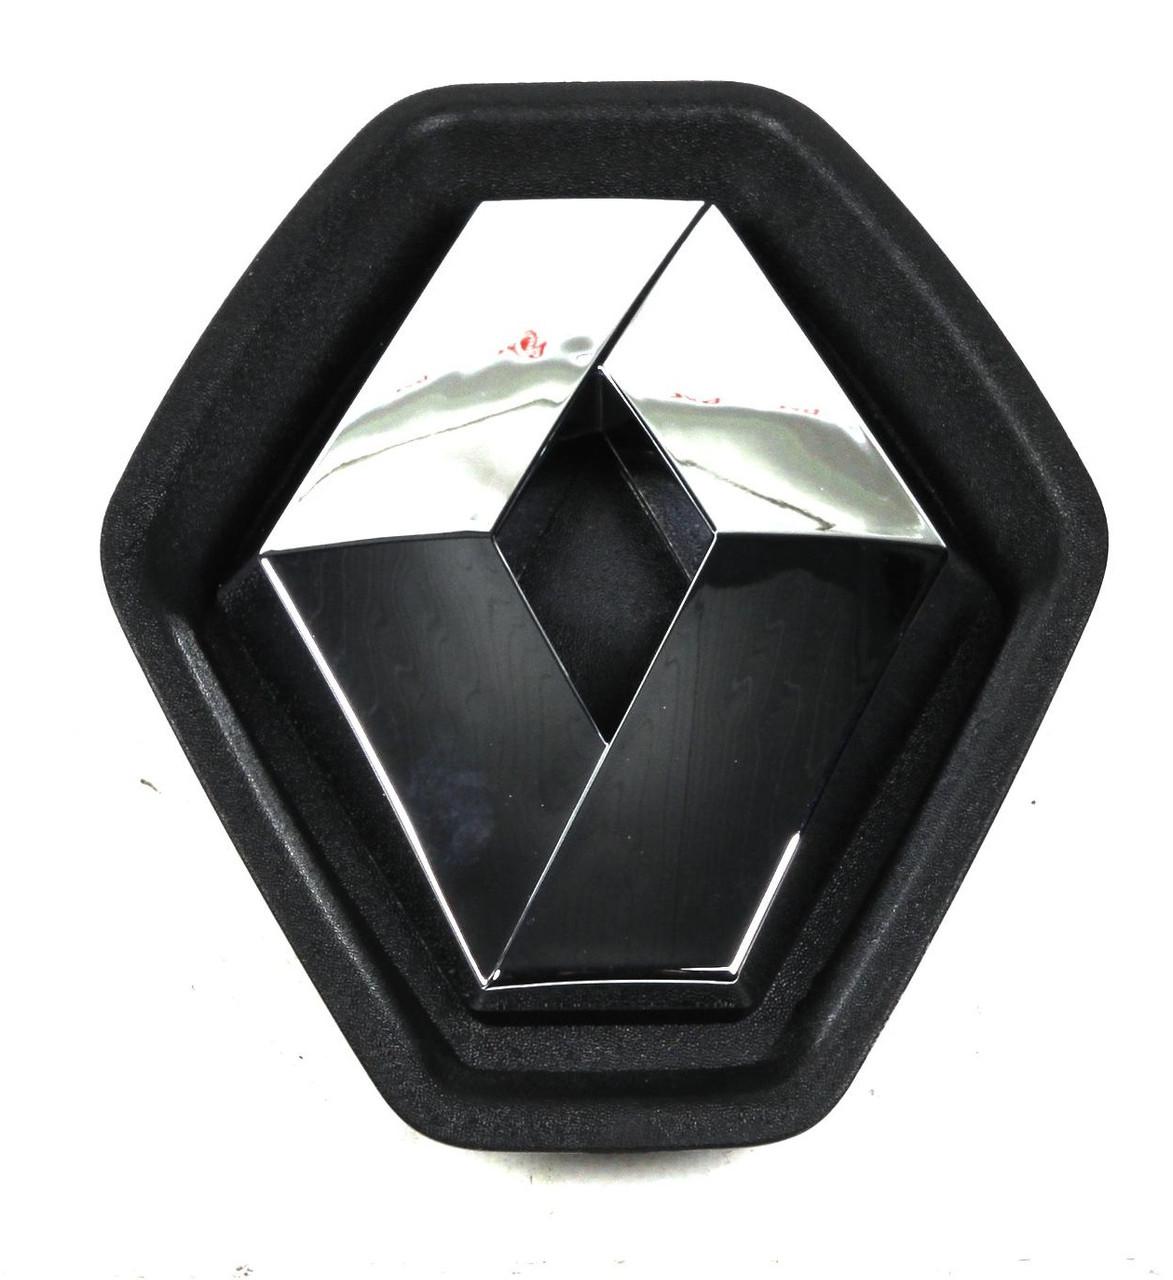 Емблема решітки радіатора Renault Master III 10- (628950003R) TruckTurk